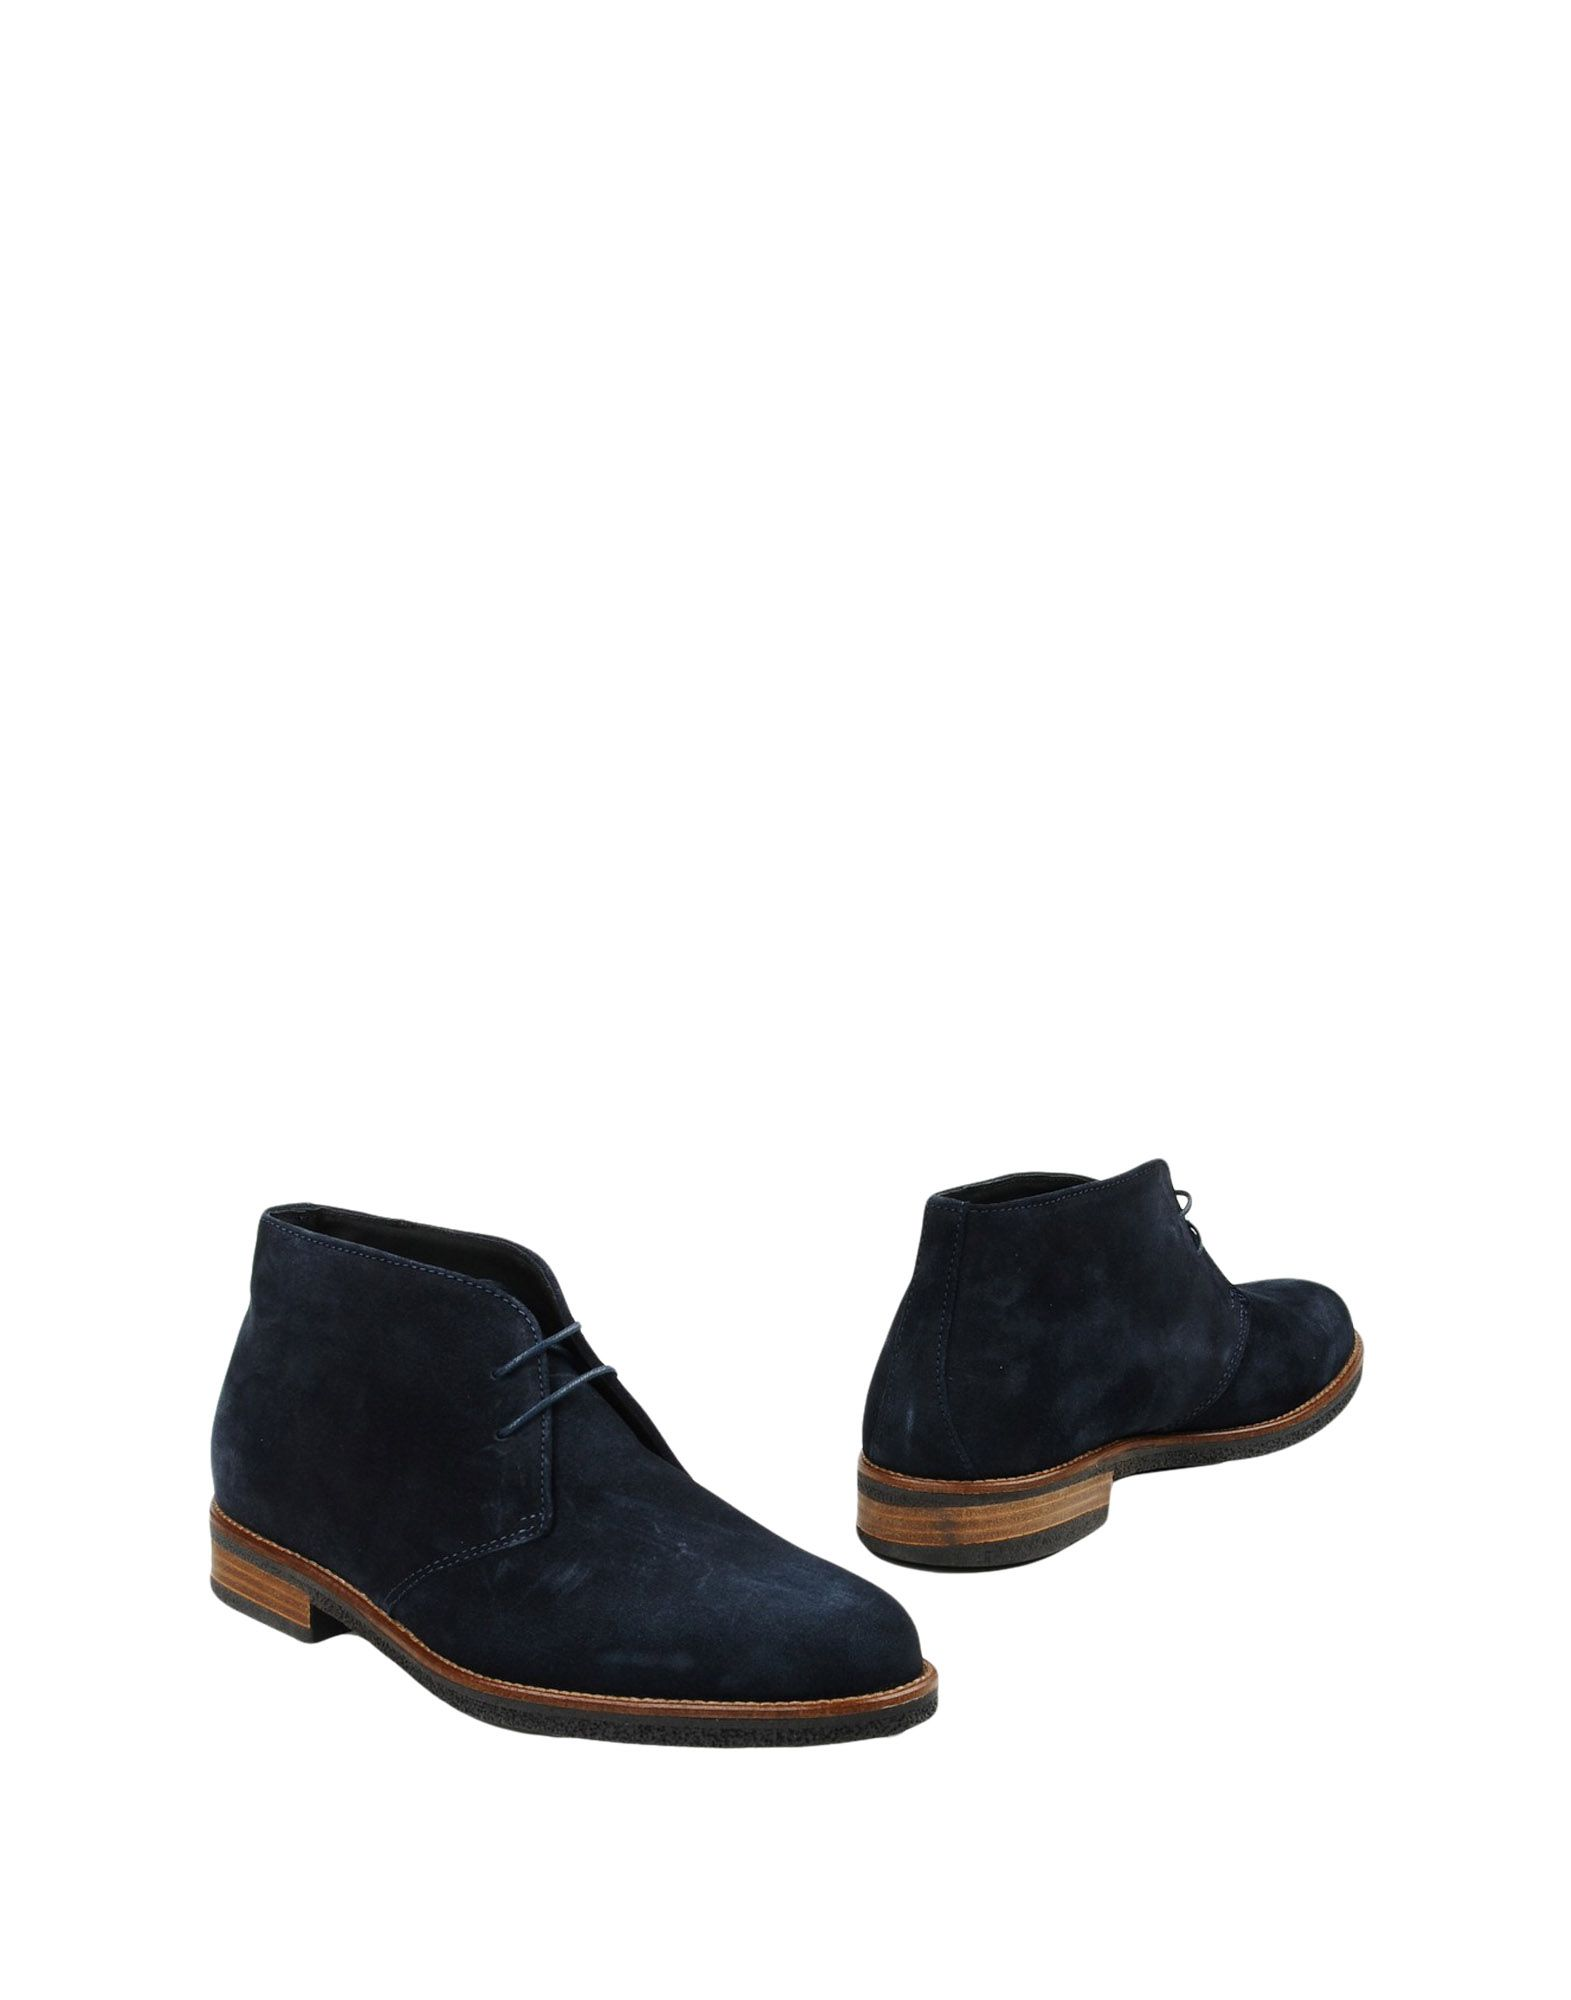 07514f2417ae94 Rabatt echte Schuhe Thompson Stiefelette Herren 11366504KJ 7ae5bf ...